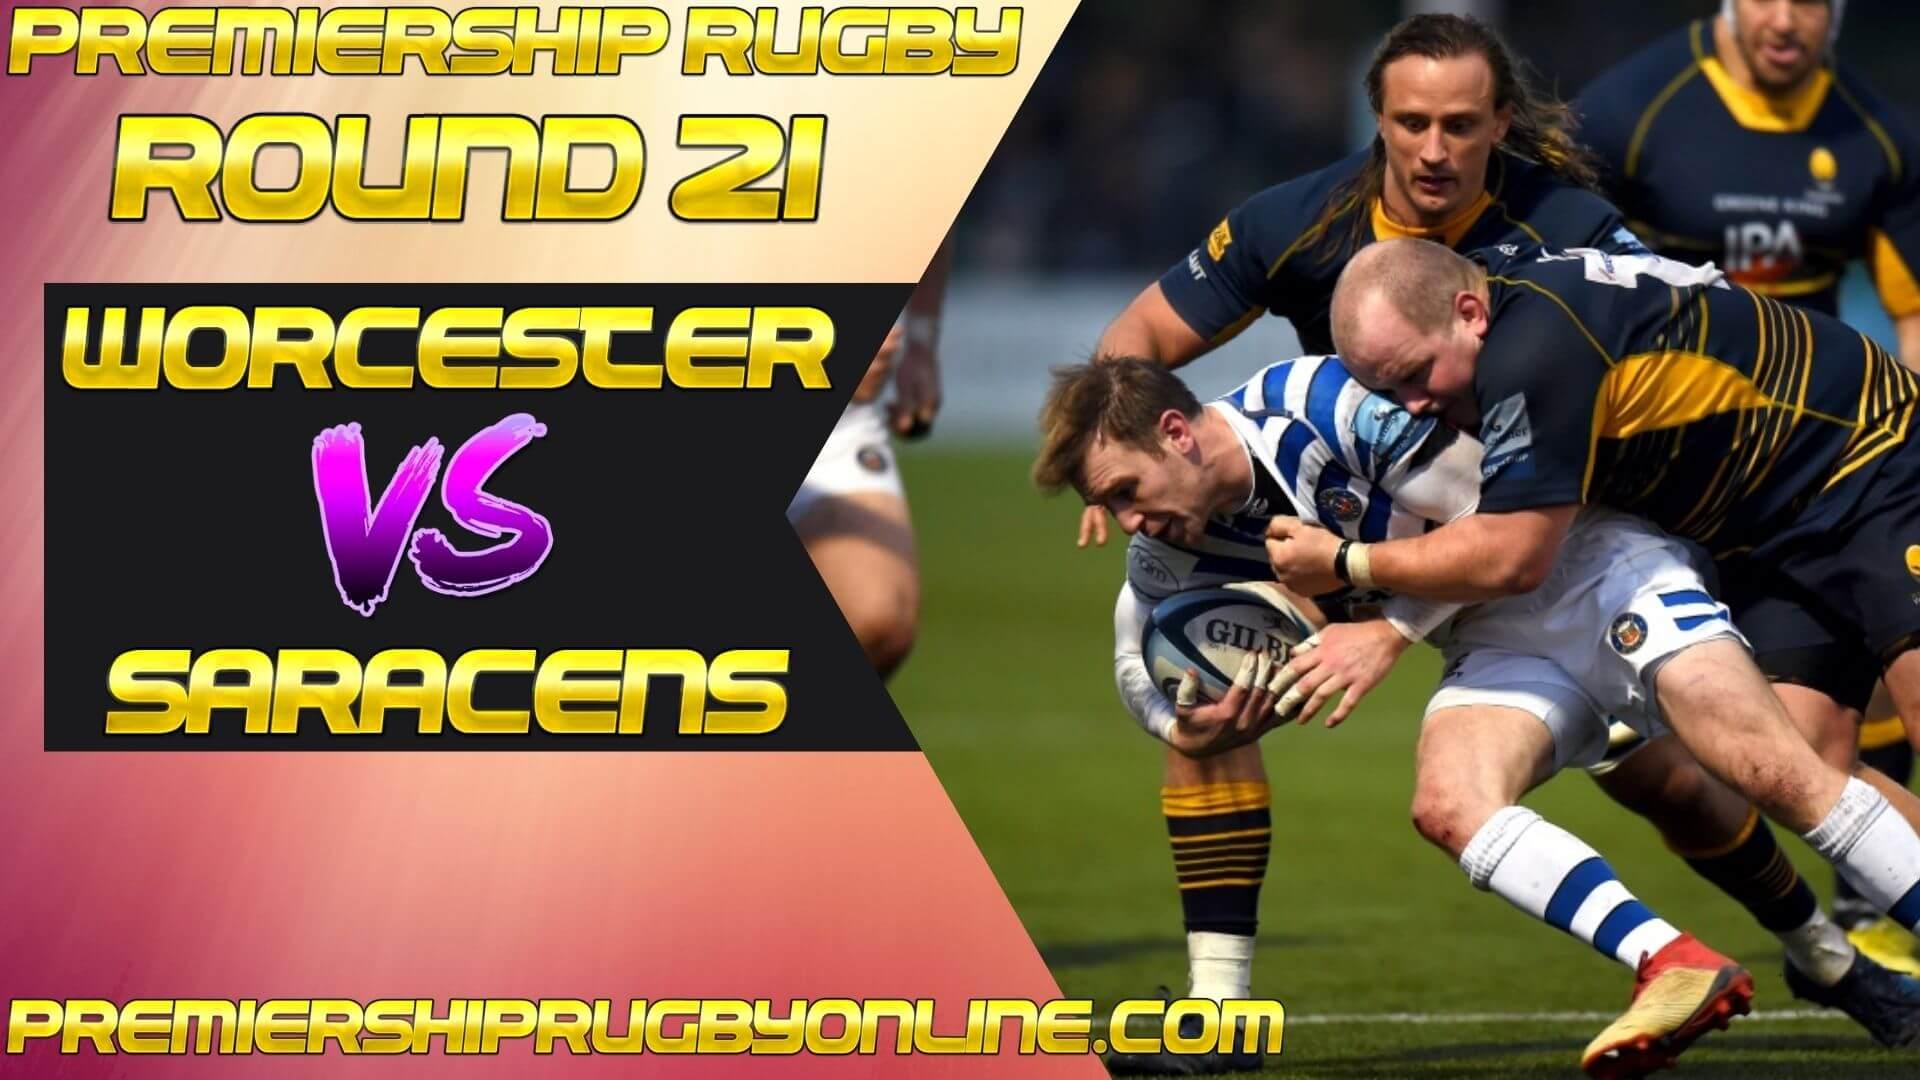 Worcester vs Saracens Live Stream   Round 21